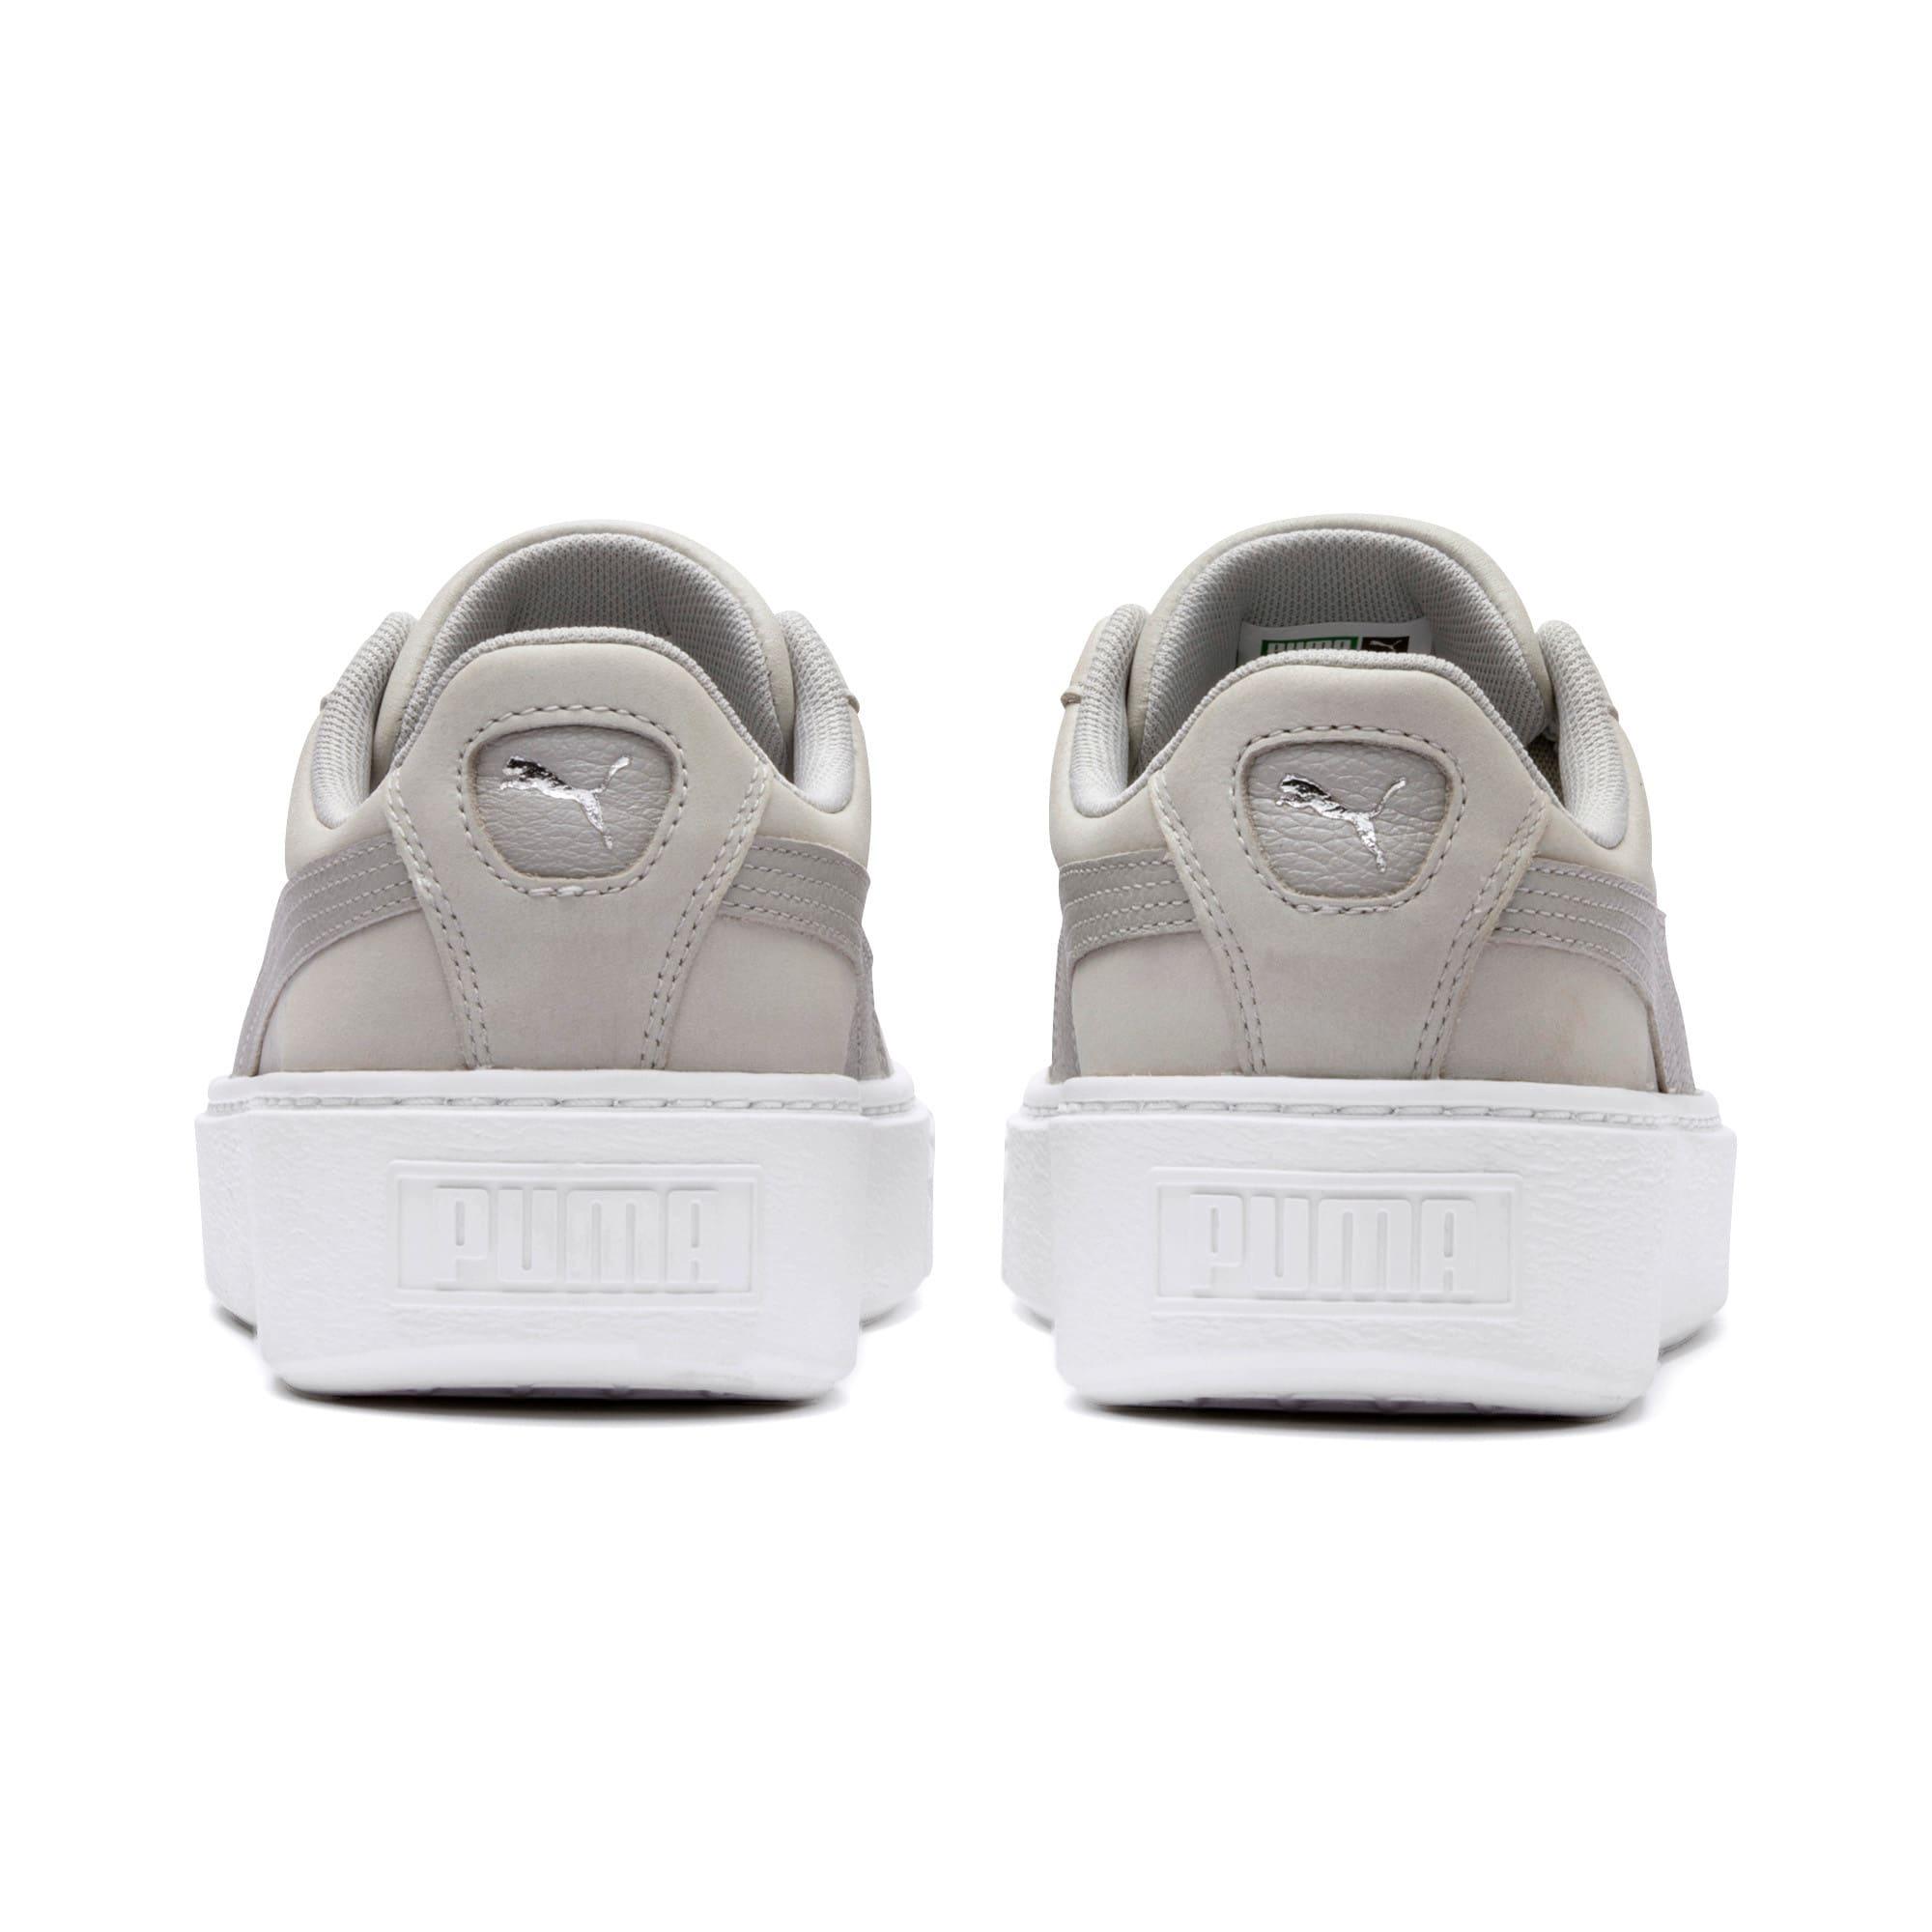 Thumbnail 4 of Suede Platform Shimmer Women's Sneakers, Gray Violet-Puma White, medium